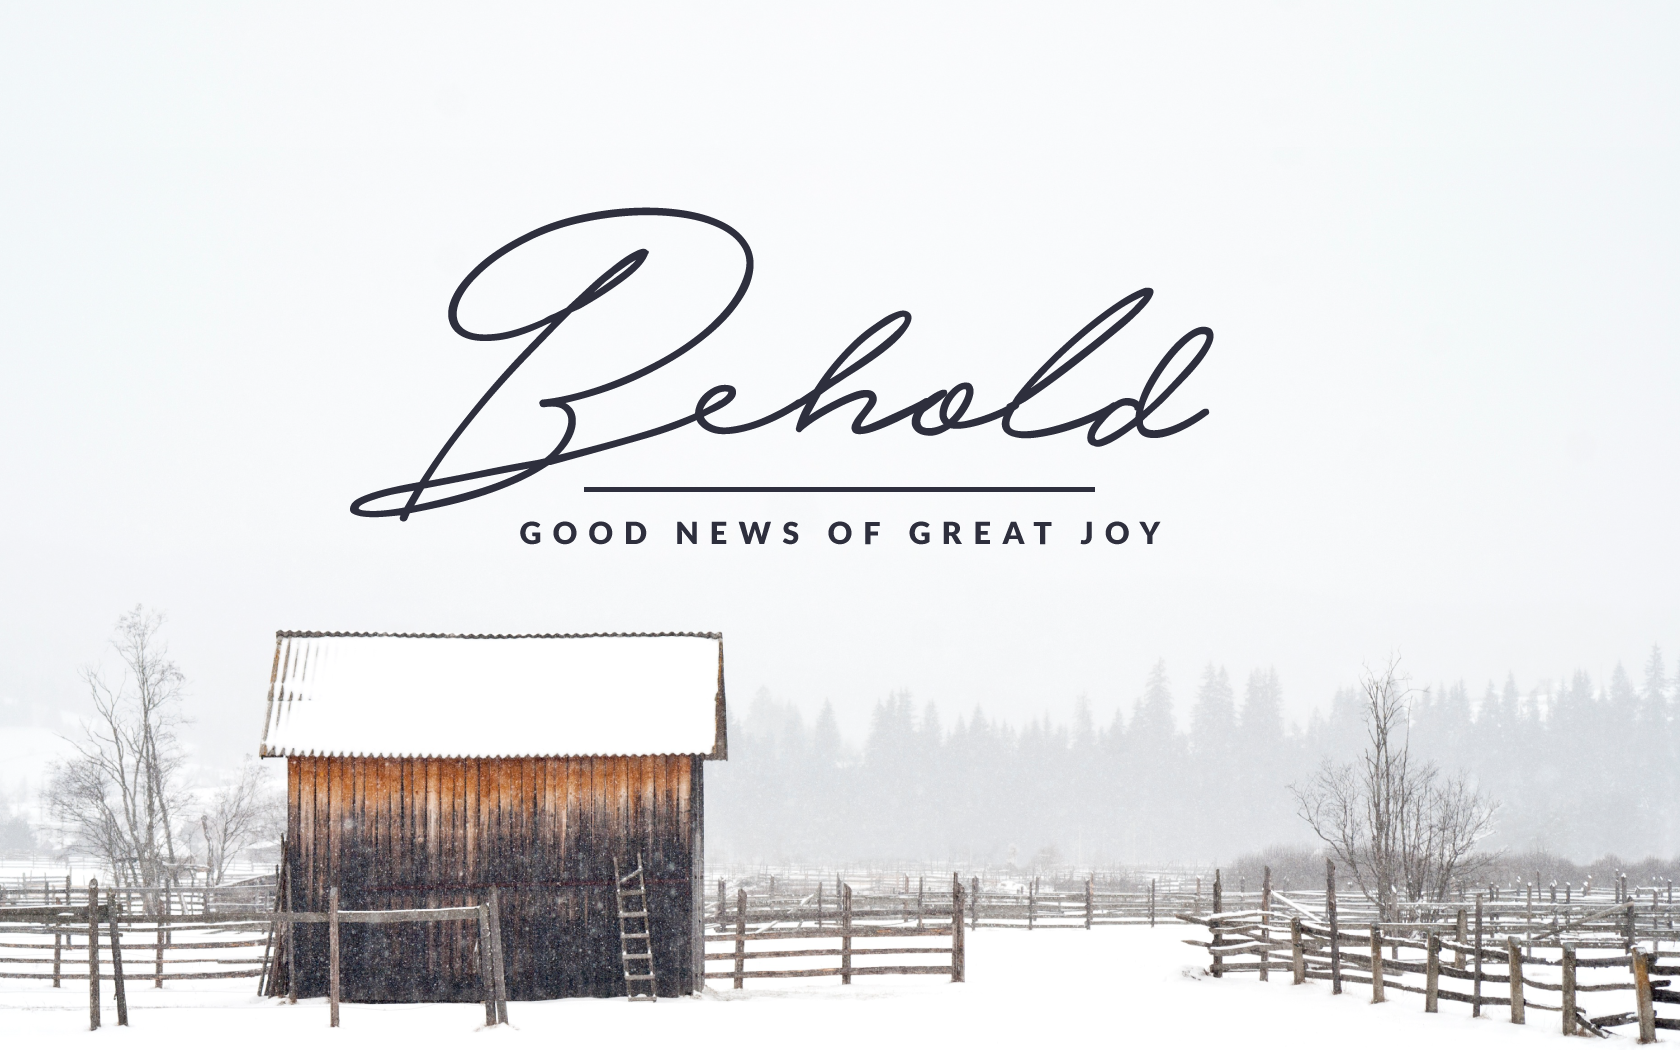 Behold: Good News of Great Joy